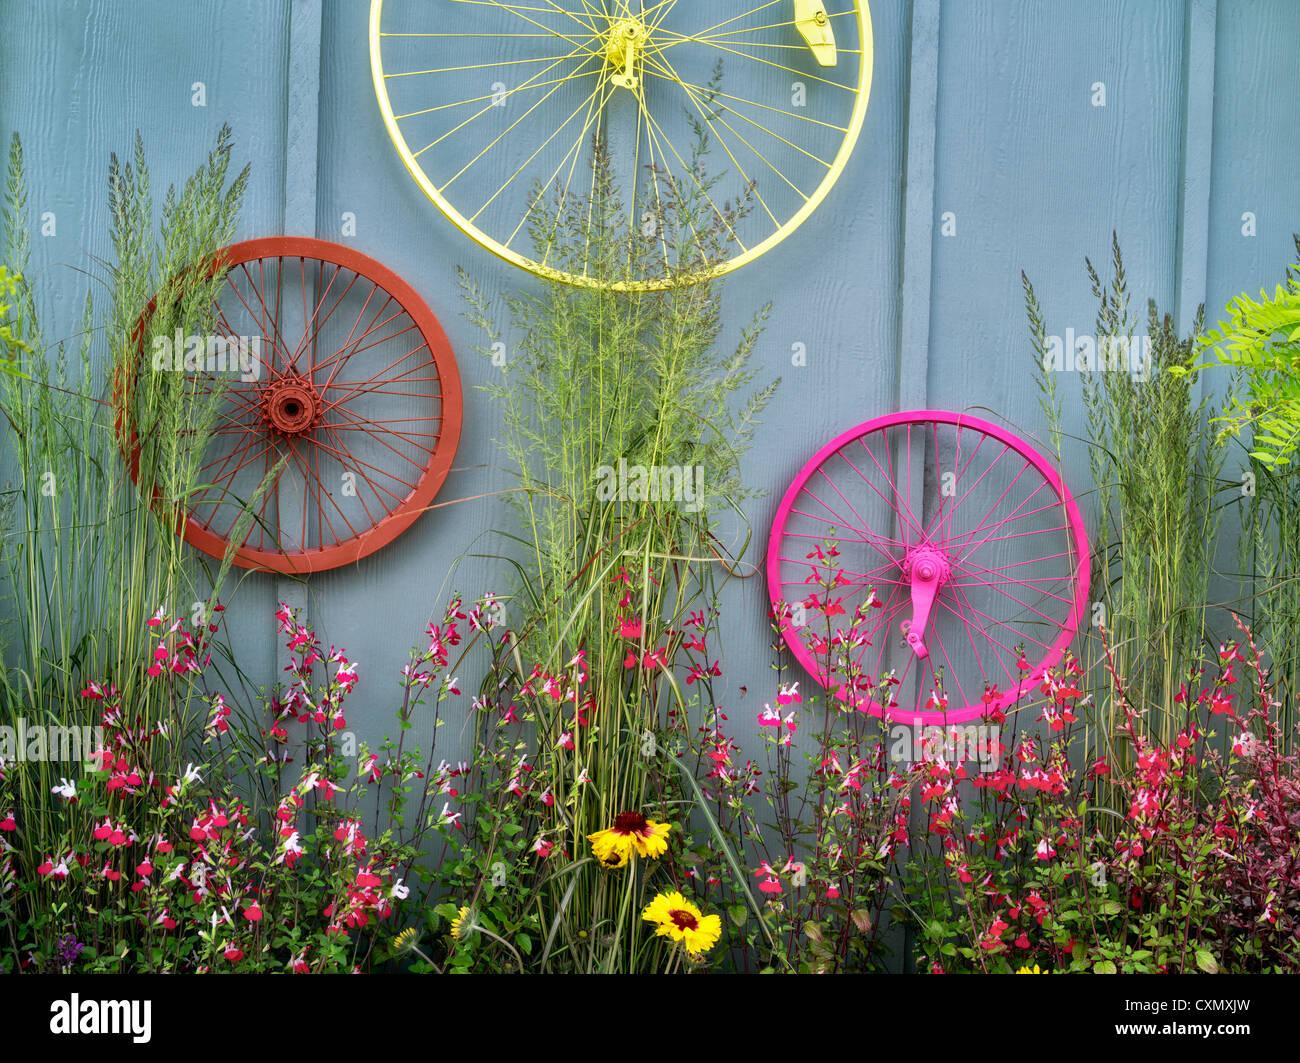 Jantes vélo affichage jardin. Al's Nursery. Sherwood, Oregon Photo Stock